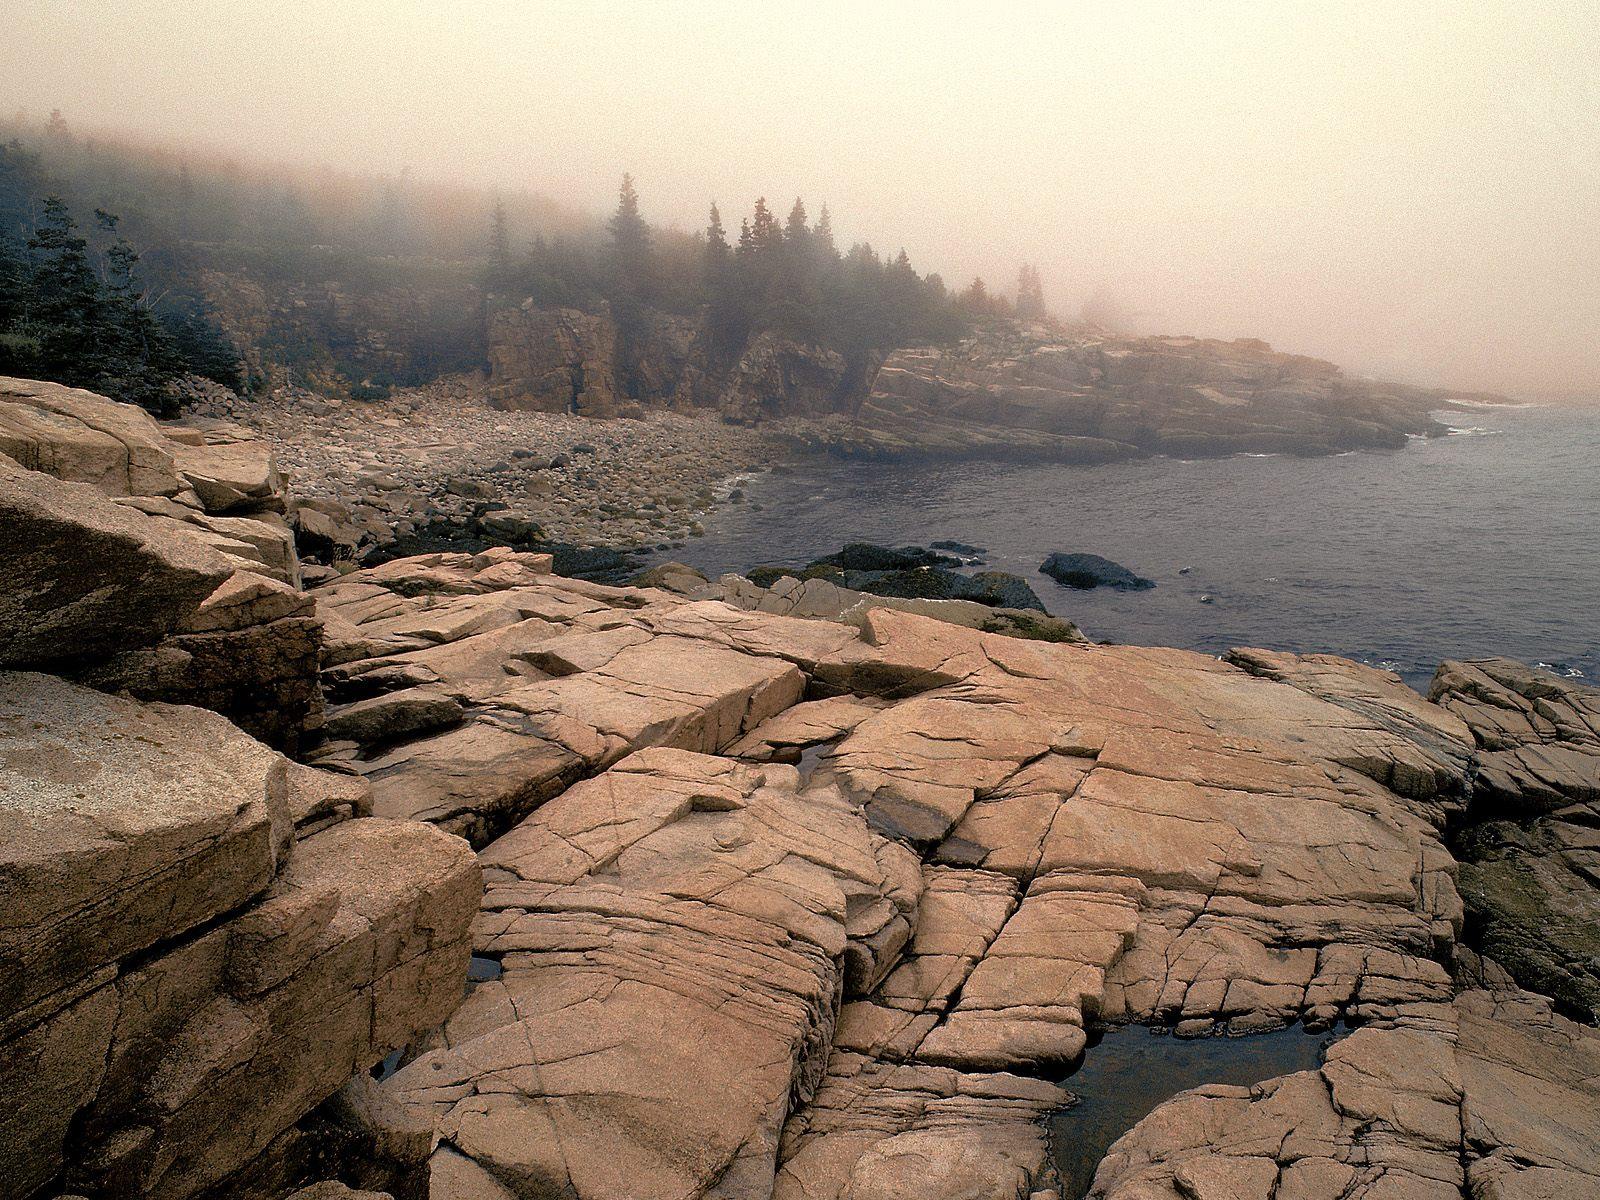 Lighthouse 3d Live Wallpaper Maine Pictures Hd Desktop Wallpapers 4k Hd